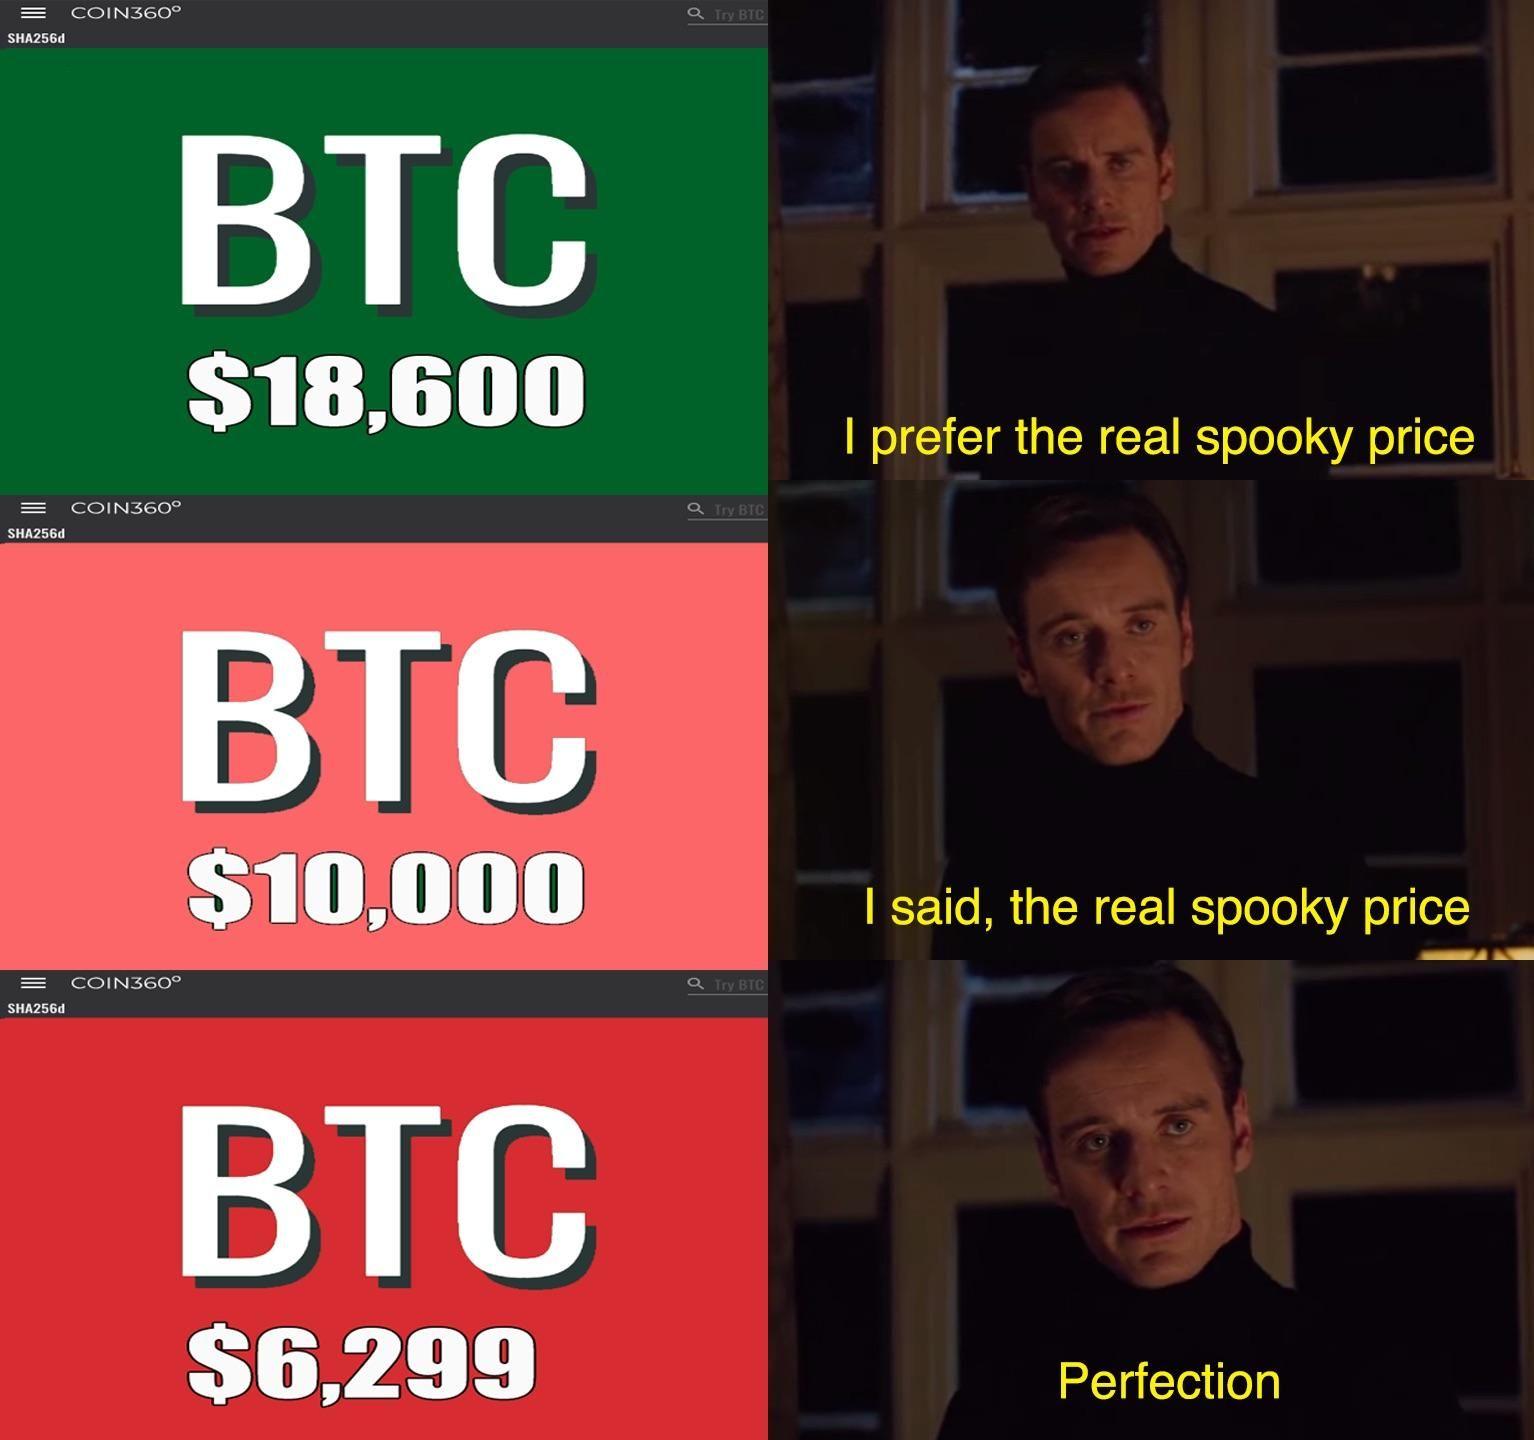 Perfection Perfection, Bitcoin, Sayings